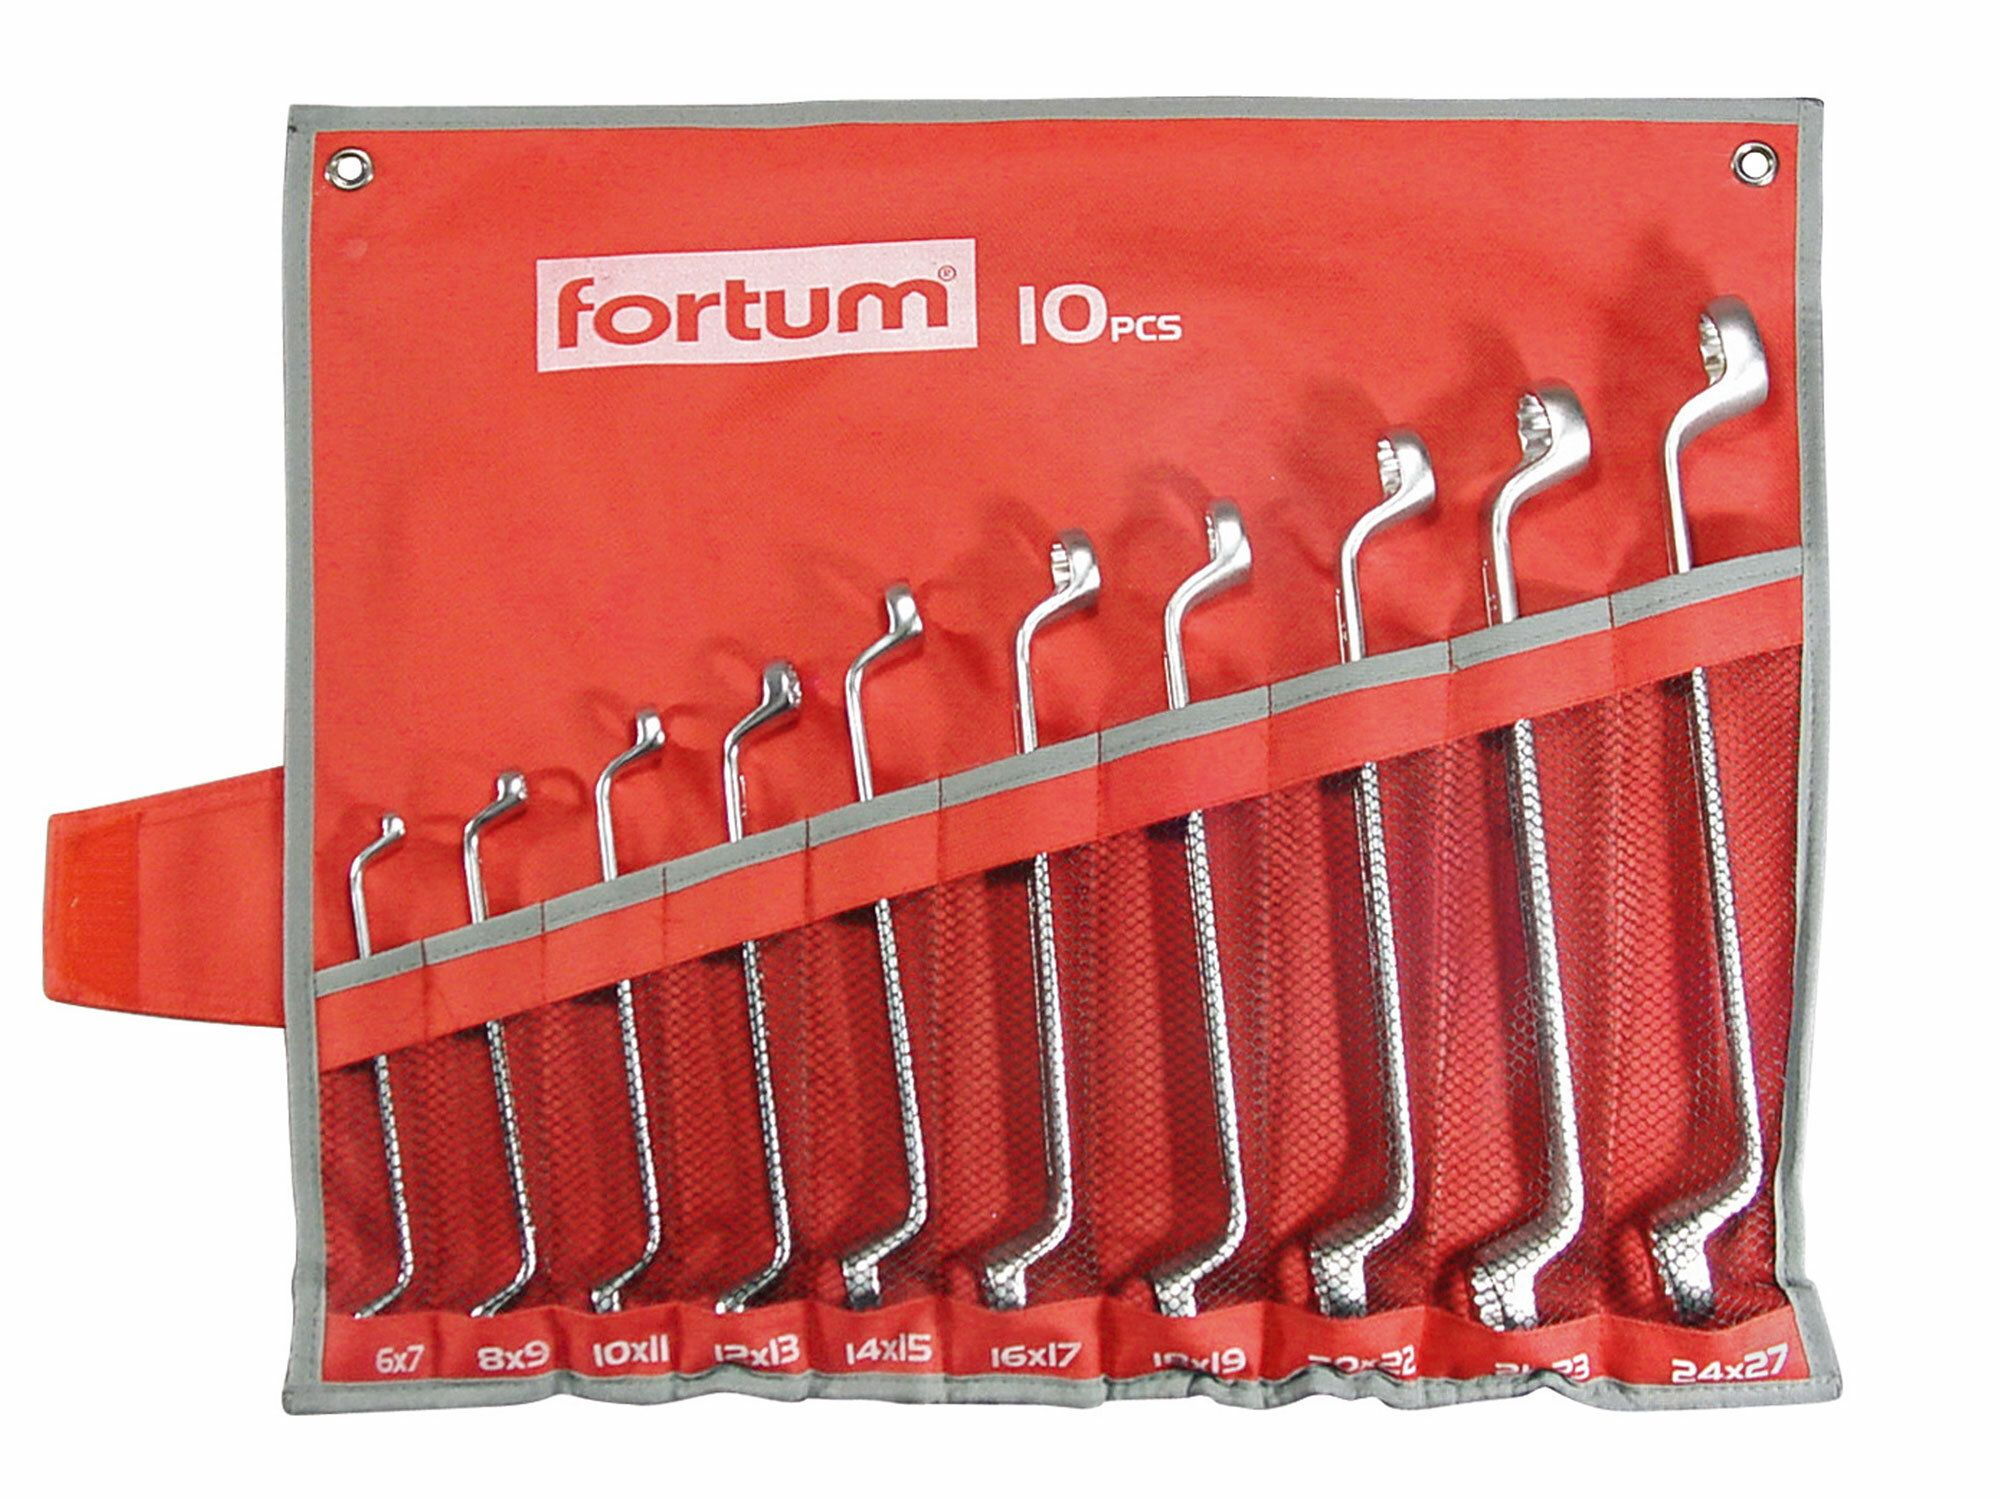 Klíče očkové 10ks, 6x7, 8x9, 10x11, 12x13, 14x15, 16x17, 18x19, 20x22, 21x23, 24x27 FORTUM